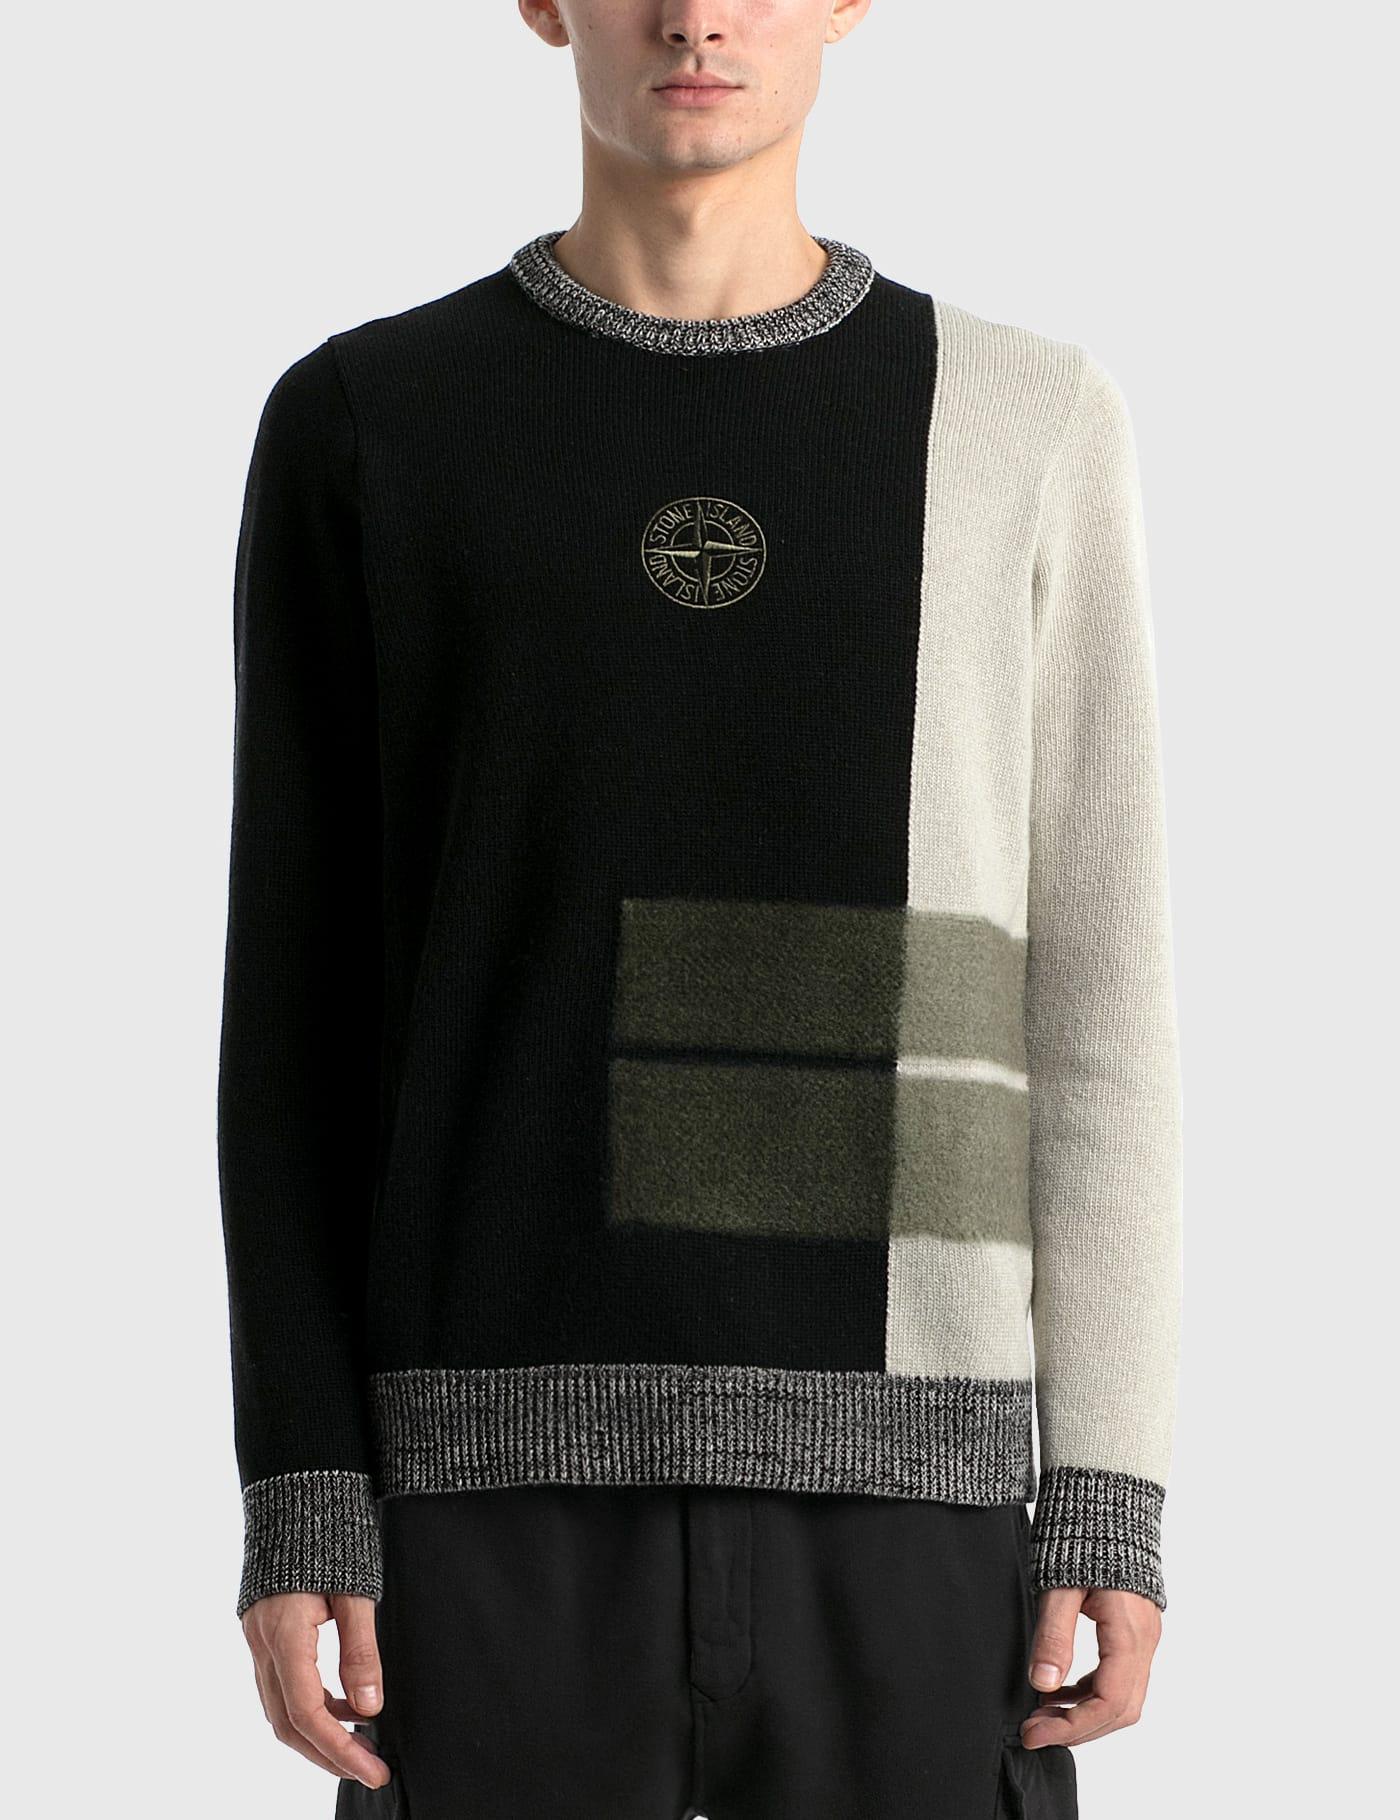 Compass Logo Knit Sweater